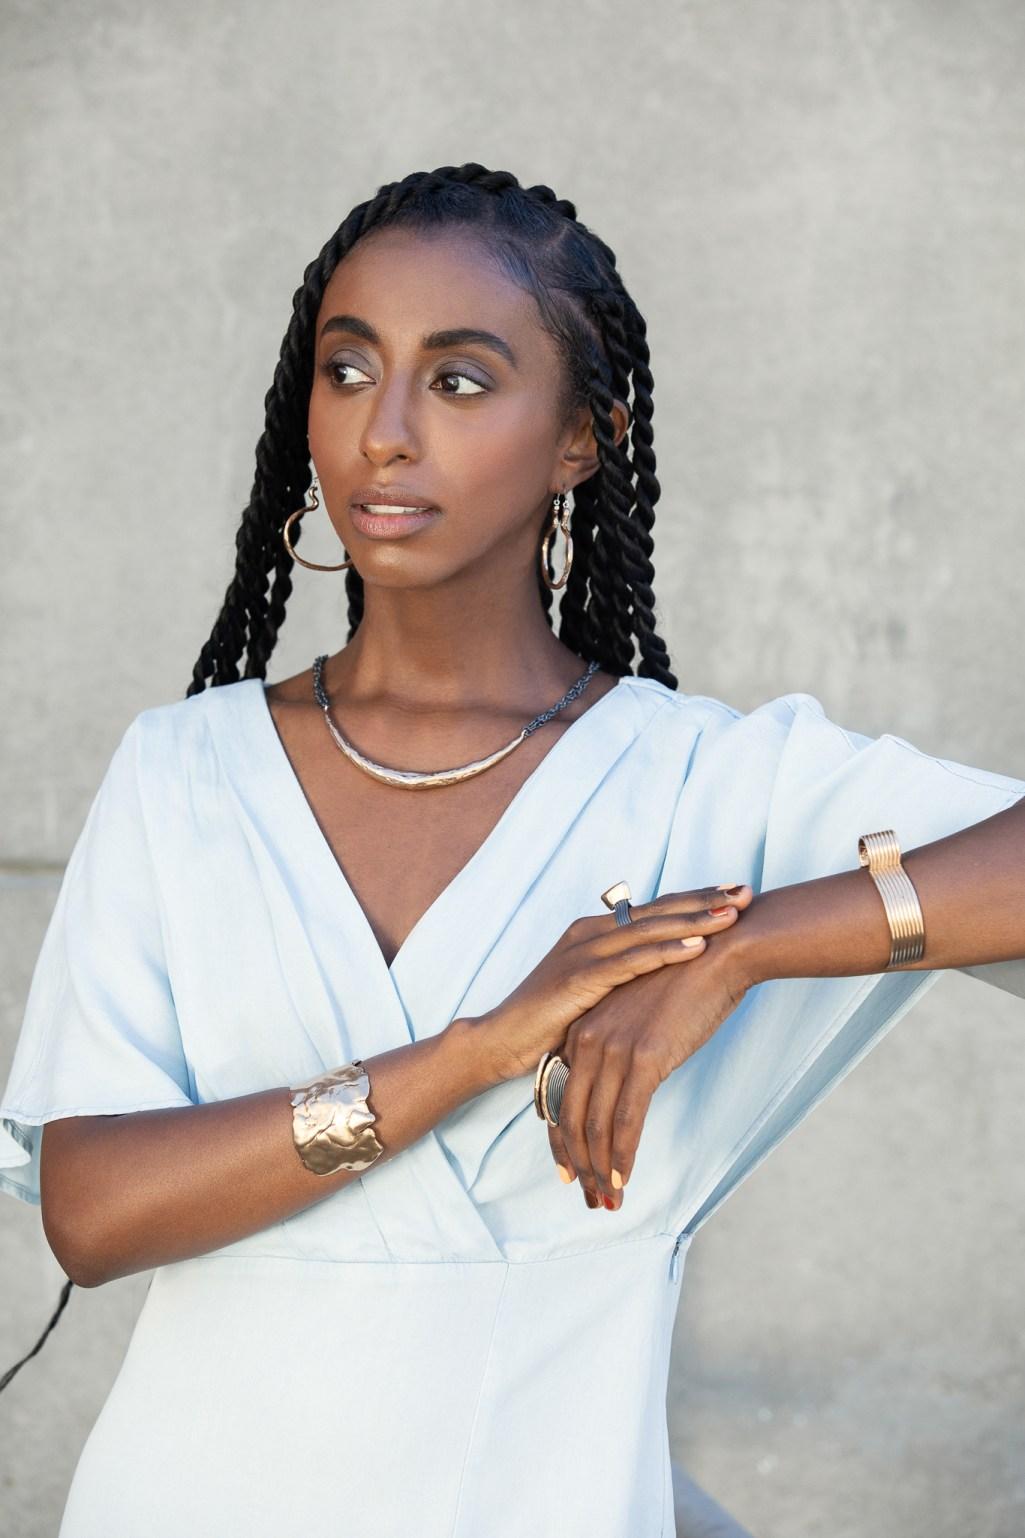 Portrait of Kalkidan Gebreyohannes showing bronze ethical jewelry. By Oakland photographer Ella Sophie